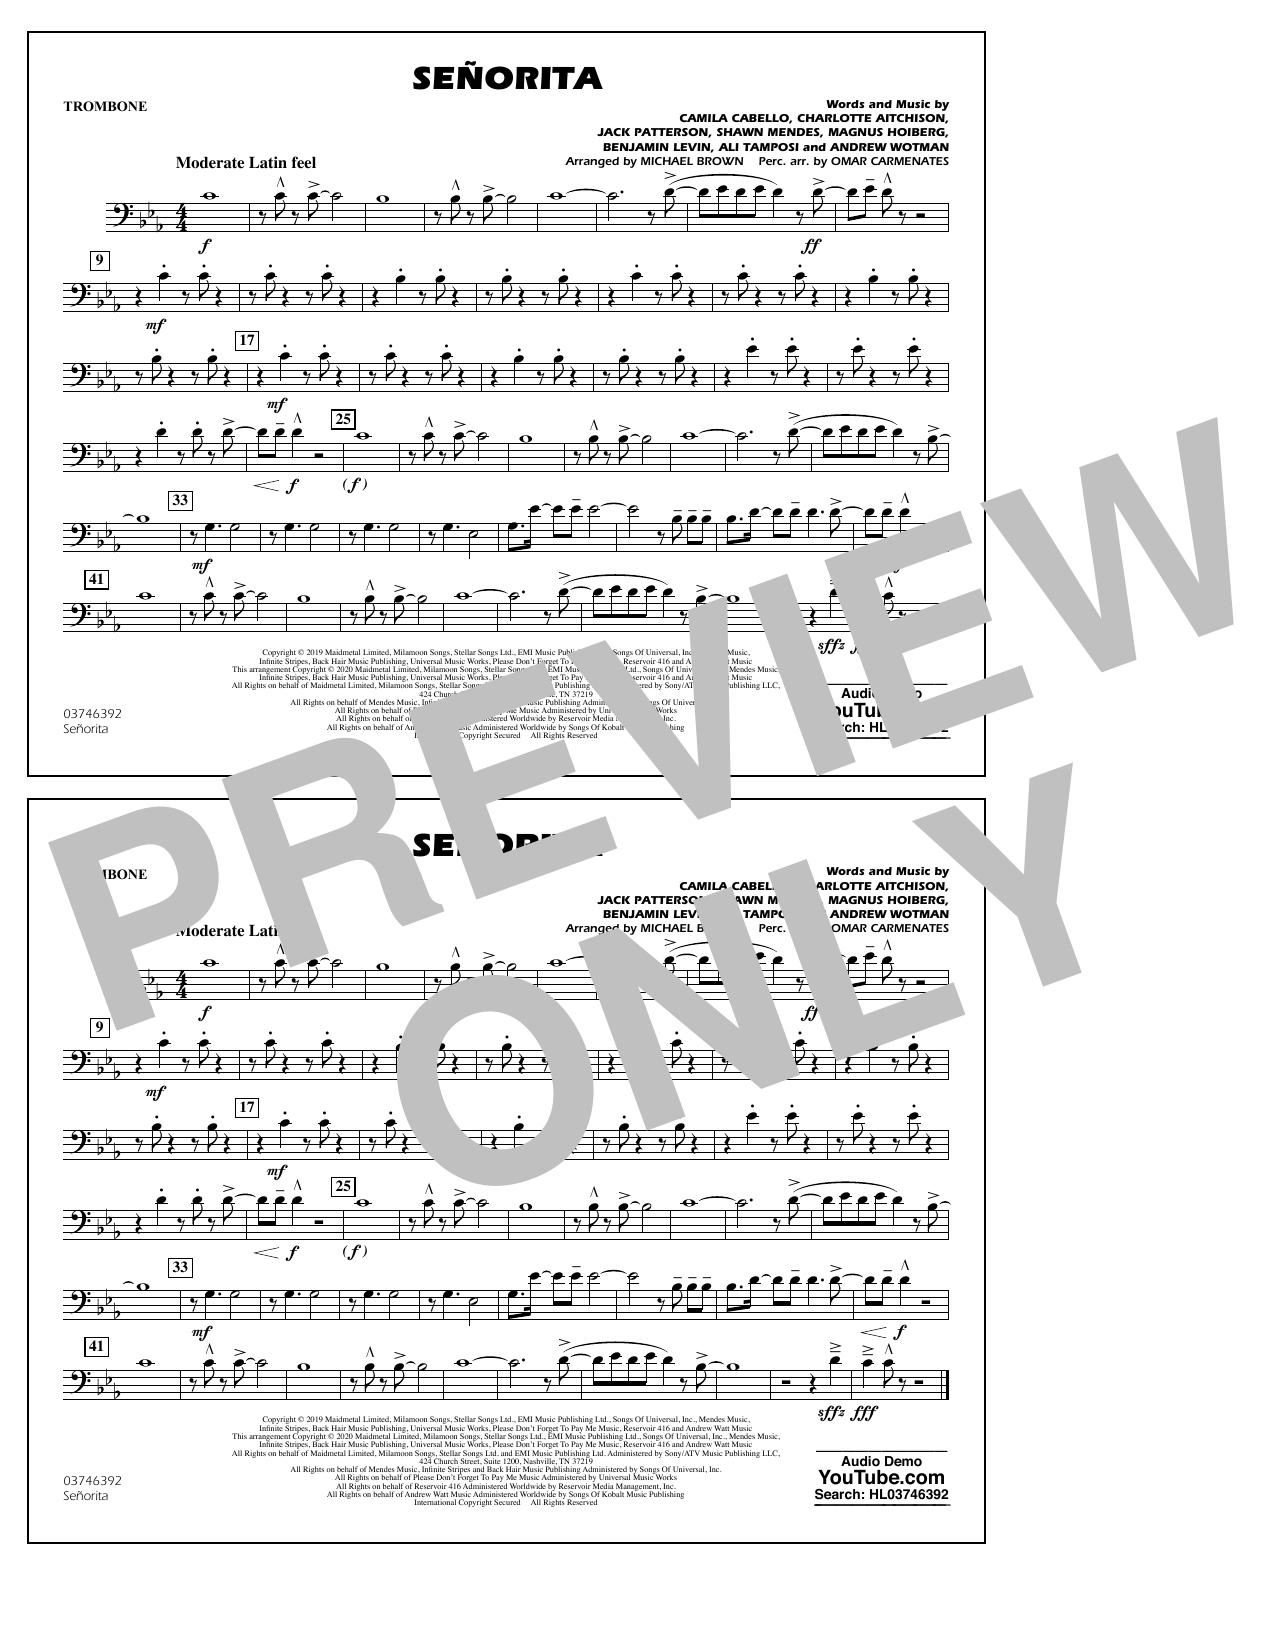 Señorita (arr. Carmenates and Brown) - Trombone (Marching Band)